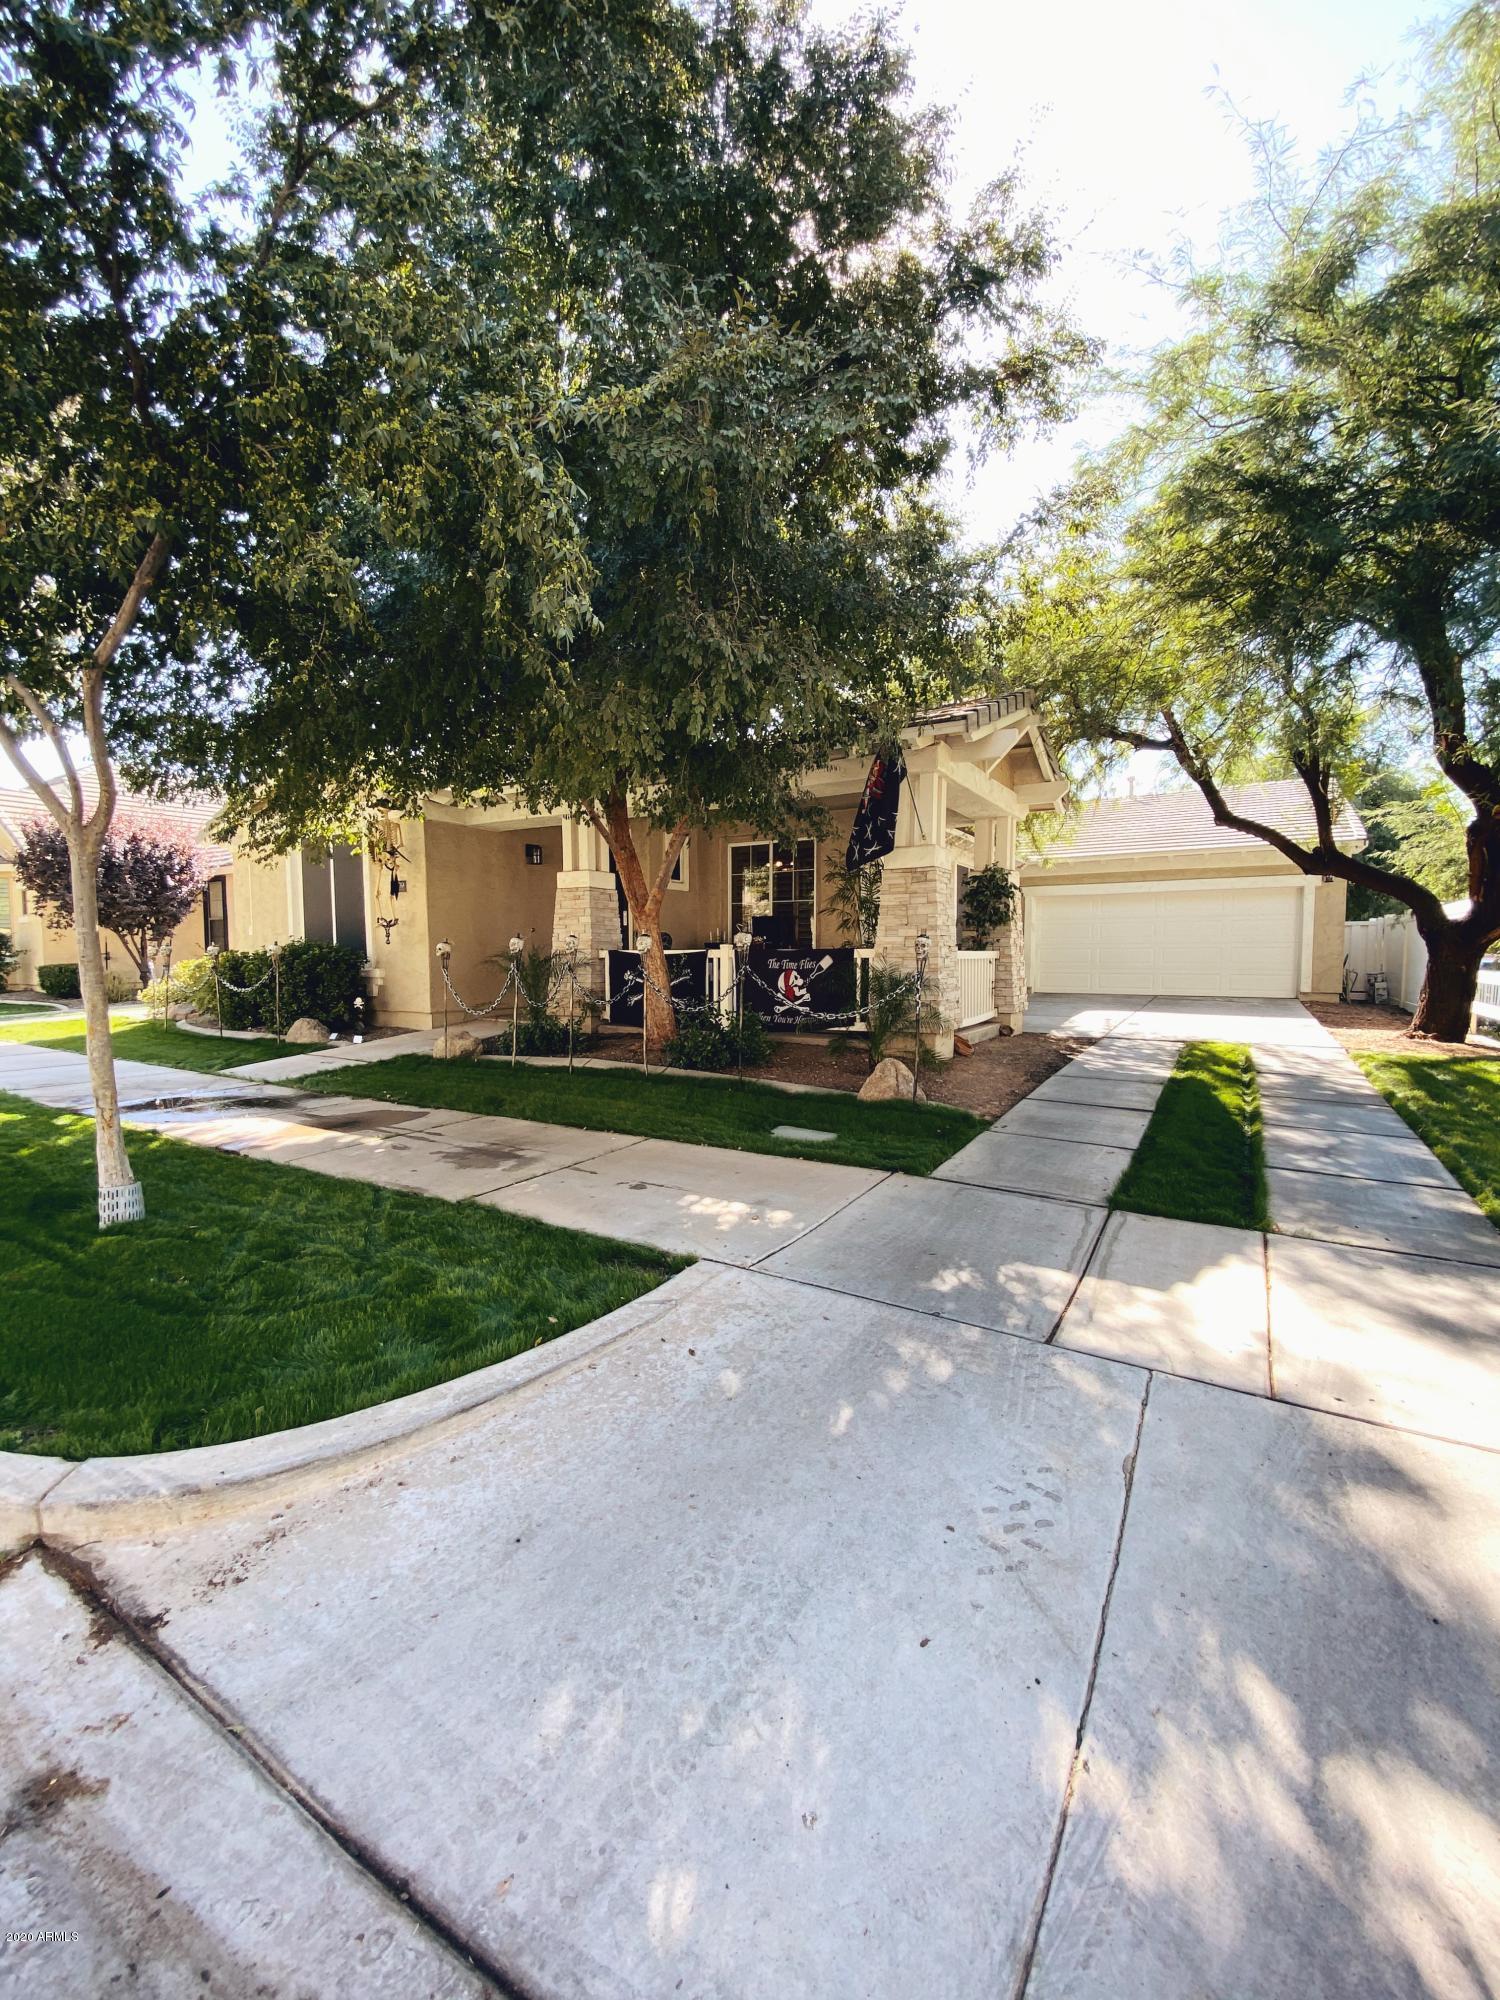 2709 VALENCIA Street, Gilbert, Arizona 85296, 4 Bedrooms Bedrooms, ,2 BathroomsBathrooms,Residential,For Sale,VALENCIA,6153392